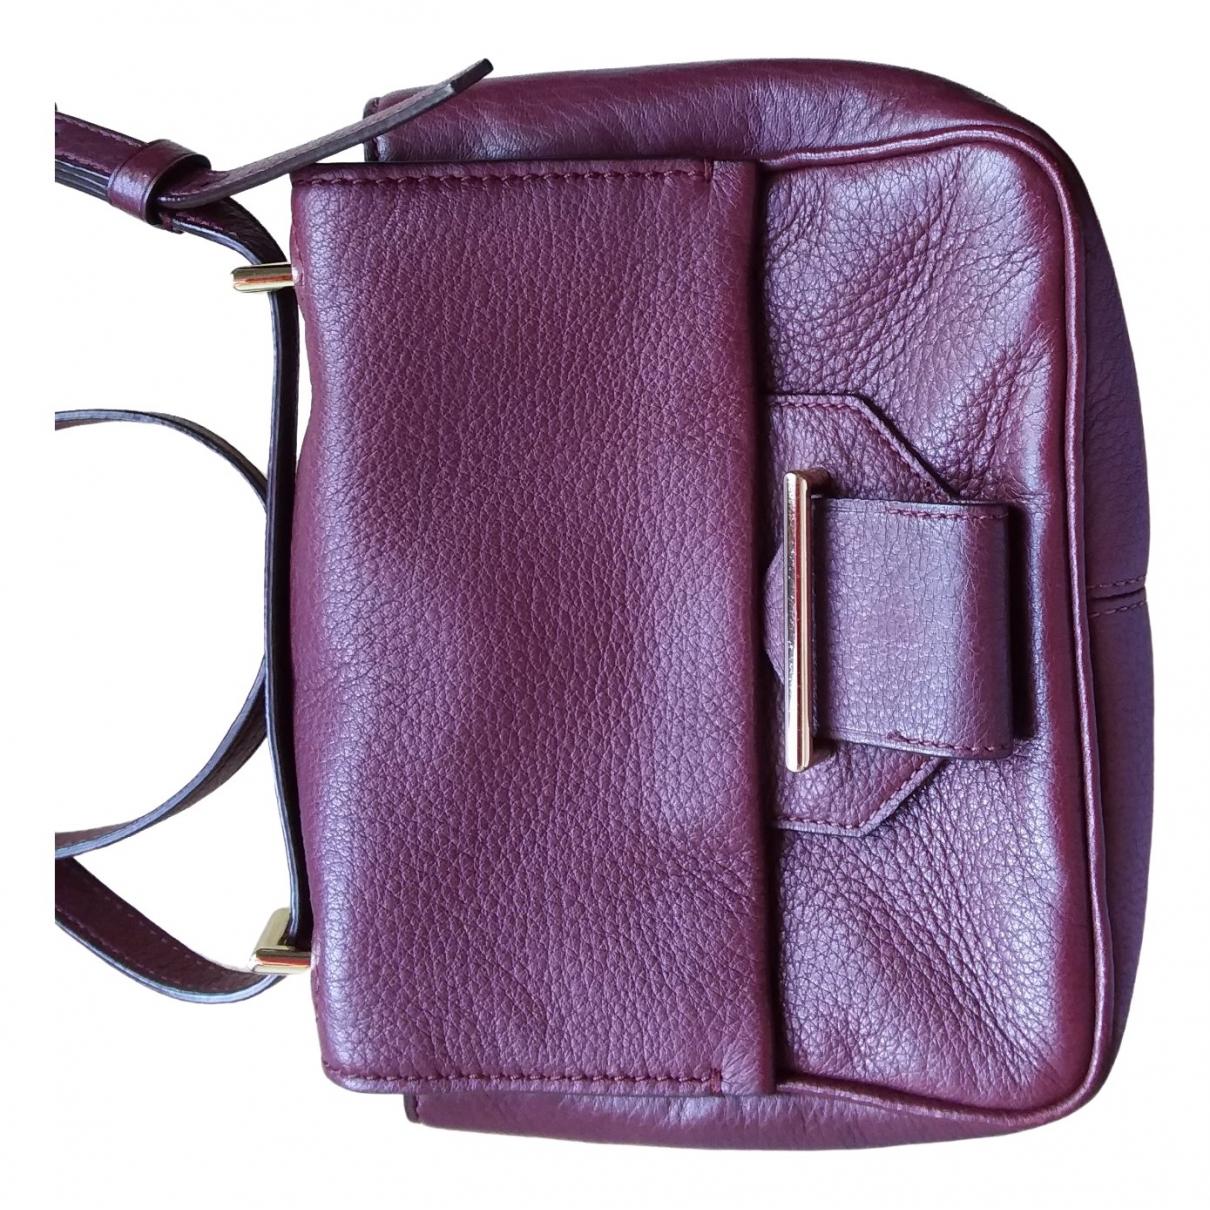 Reed Krakoff \N Handtasche in  Bordeauxrot Leder